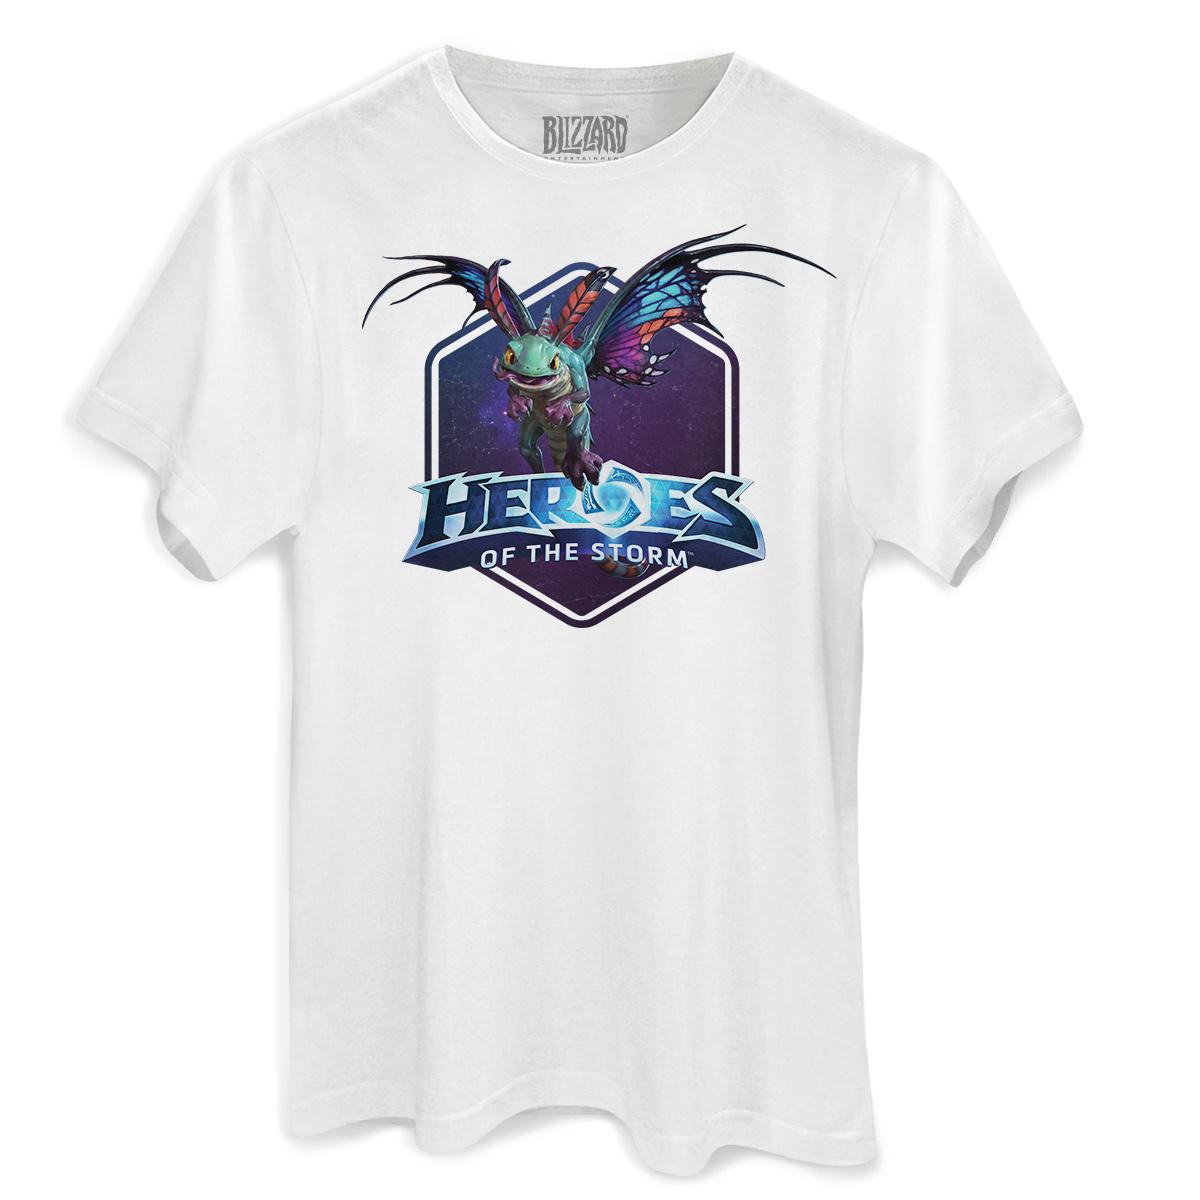 Camiseta Masculina Heroes Of The Storm Asaluz